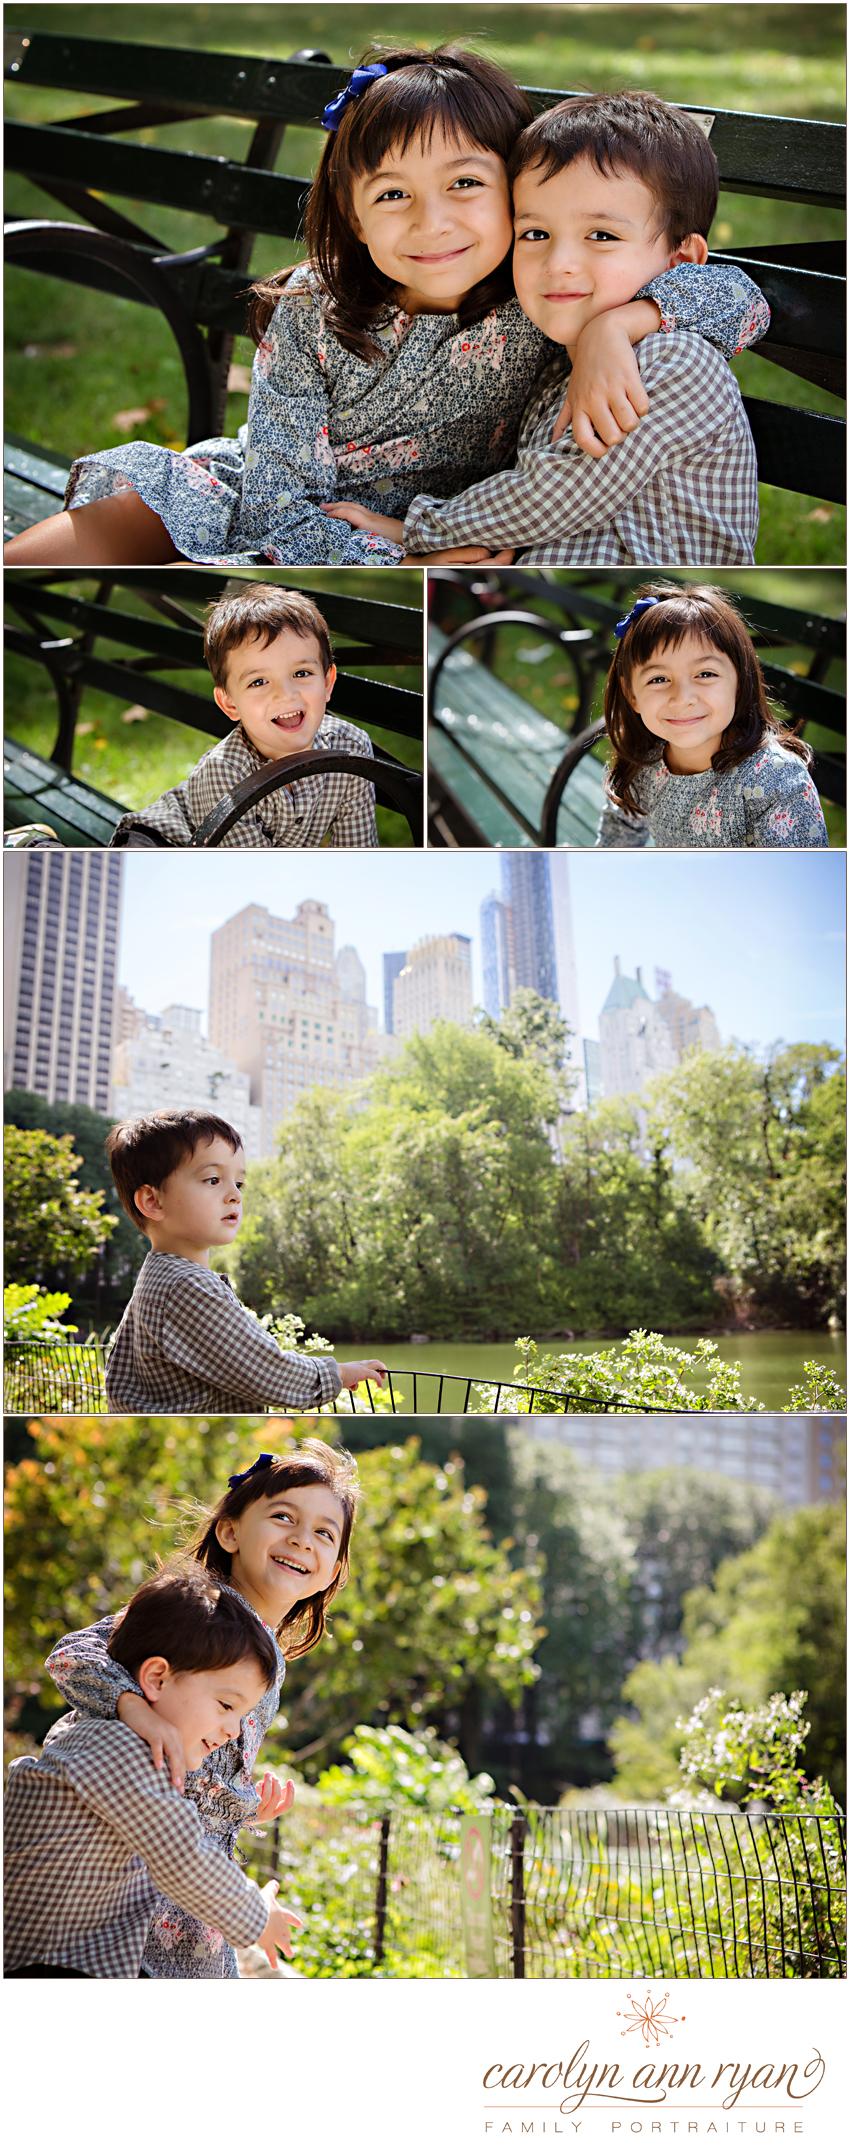 Charlotte Metro Child and Family Photographer Carolyn Ann Ryan